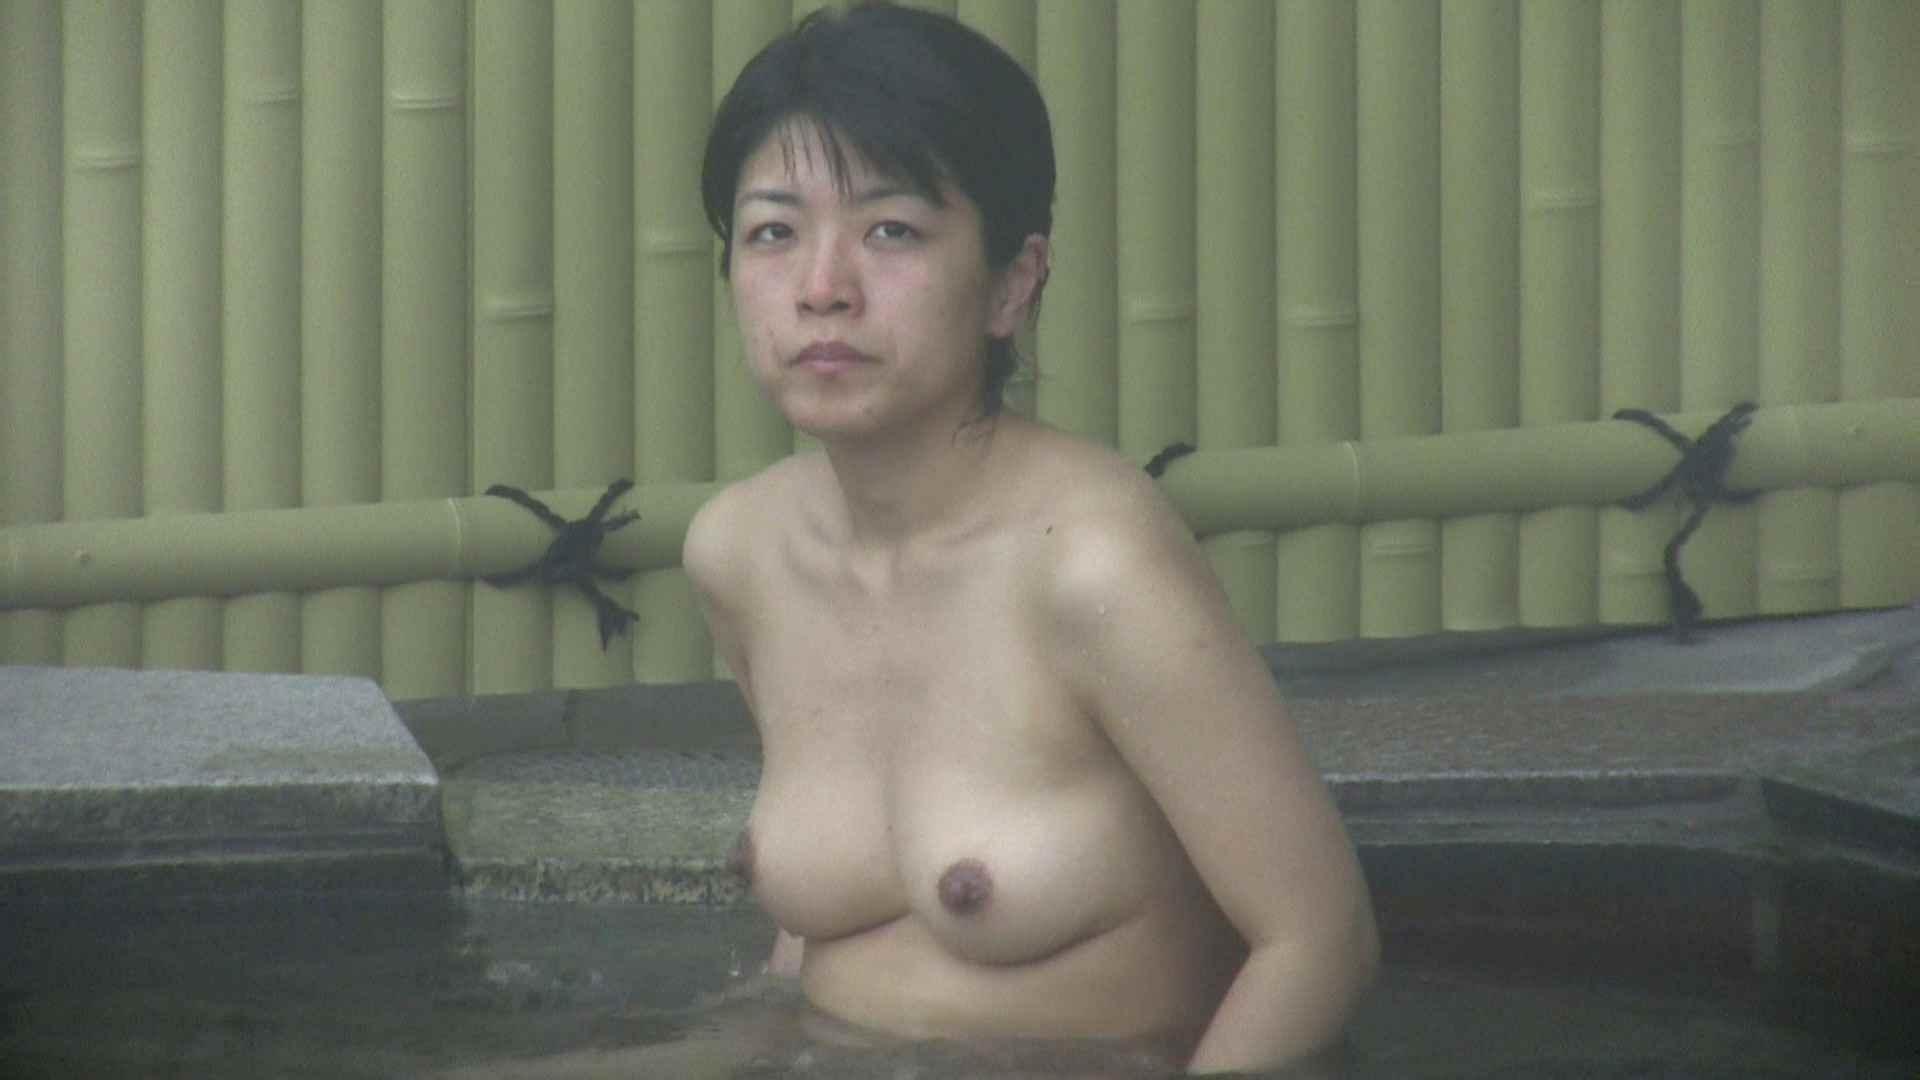 Aquaな露天風呂Vol.585 HなOL | 盗撮  93pic 71